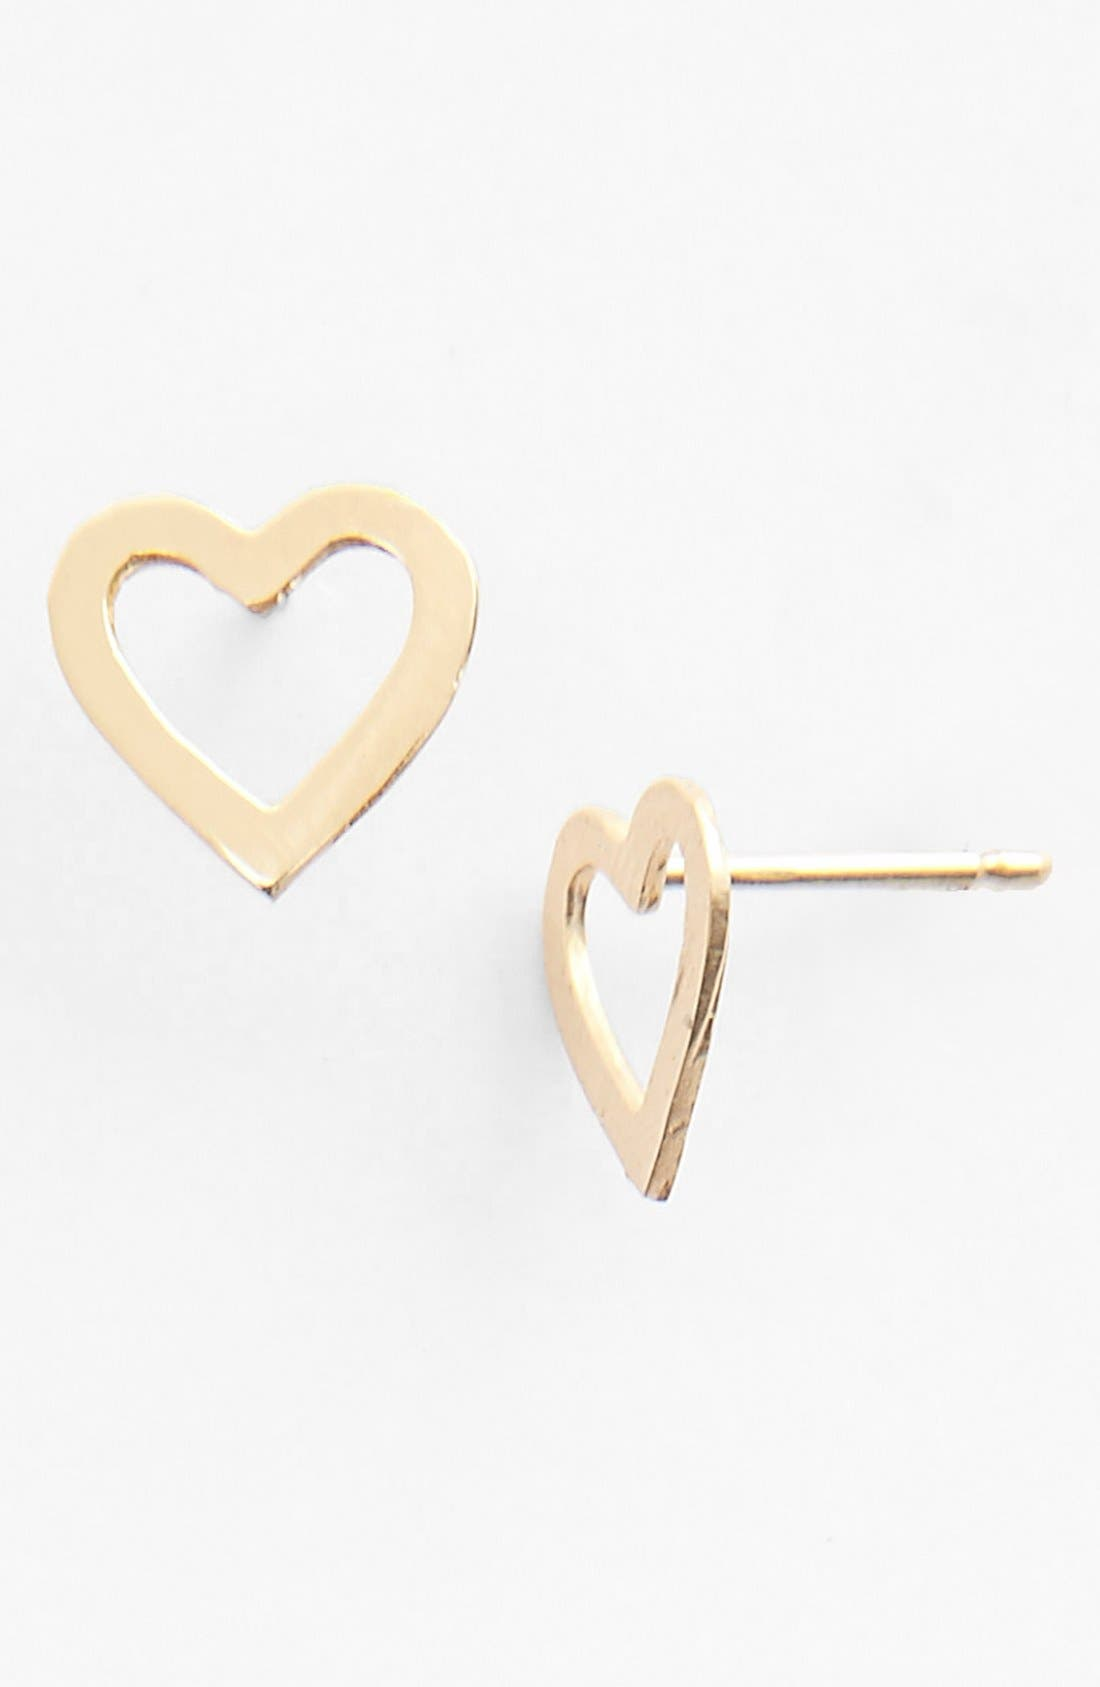 Alternate Image 1 Selected - Lana Jewelry 'Spellbound' Heart Stud Earrings